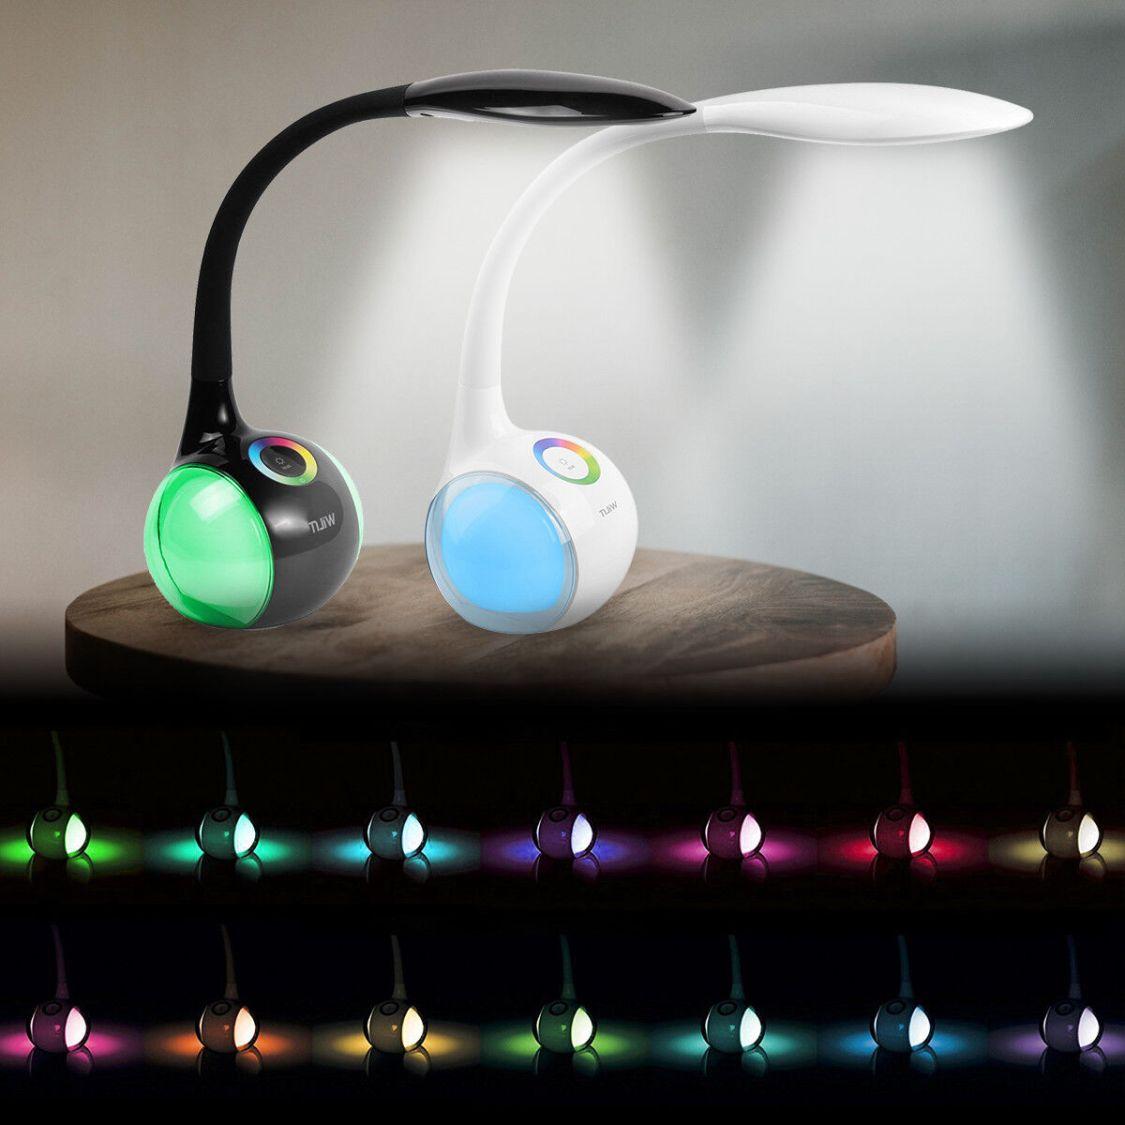 5W LED Tisch-Leuchte Schreibtisch-Lampe Büro dimmbar Touch Leselampe Nachttisch